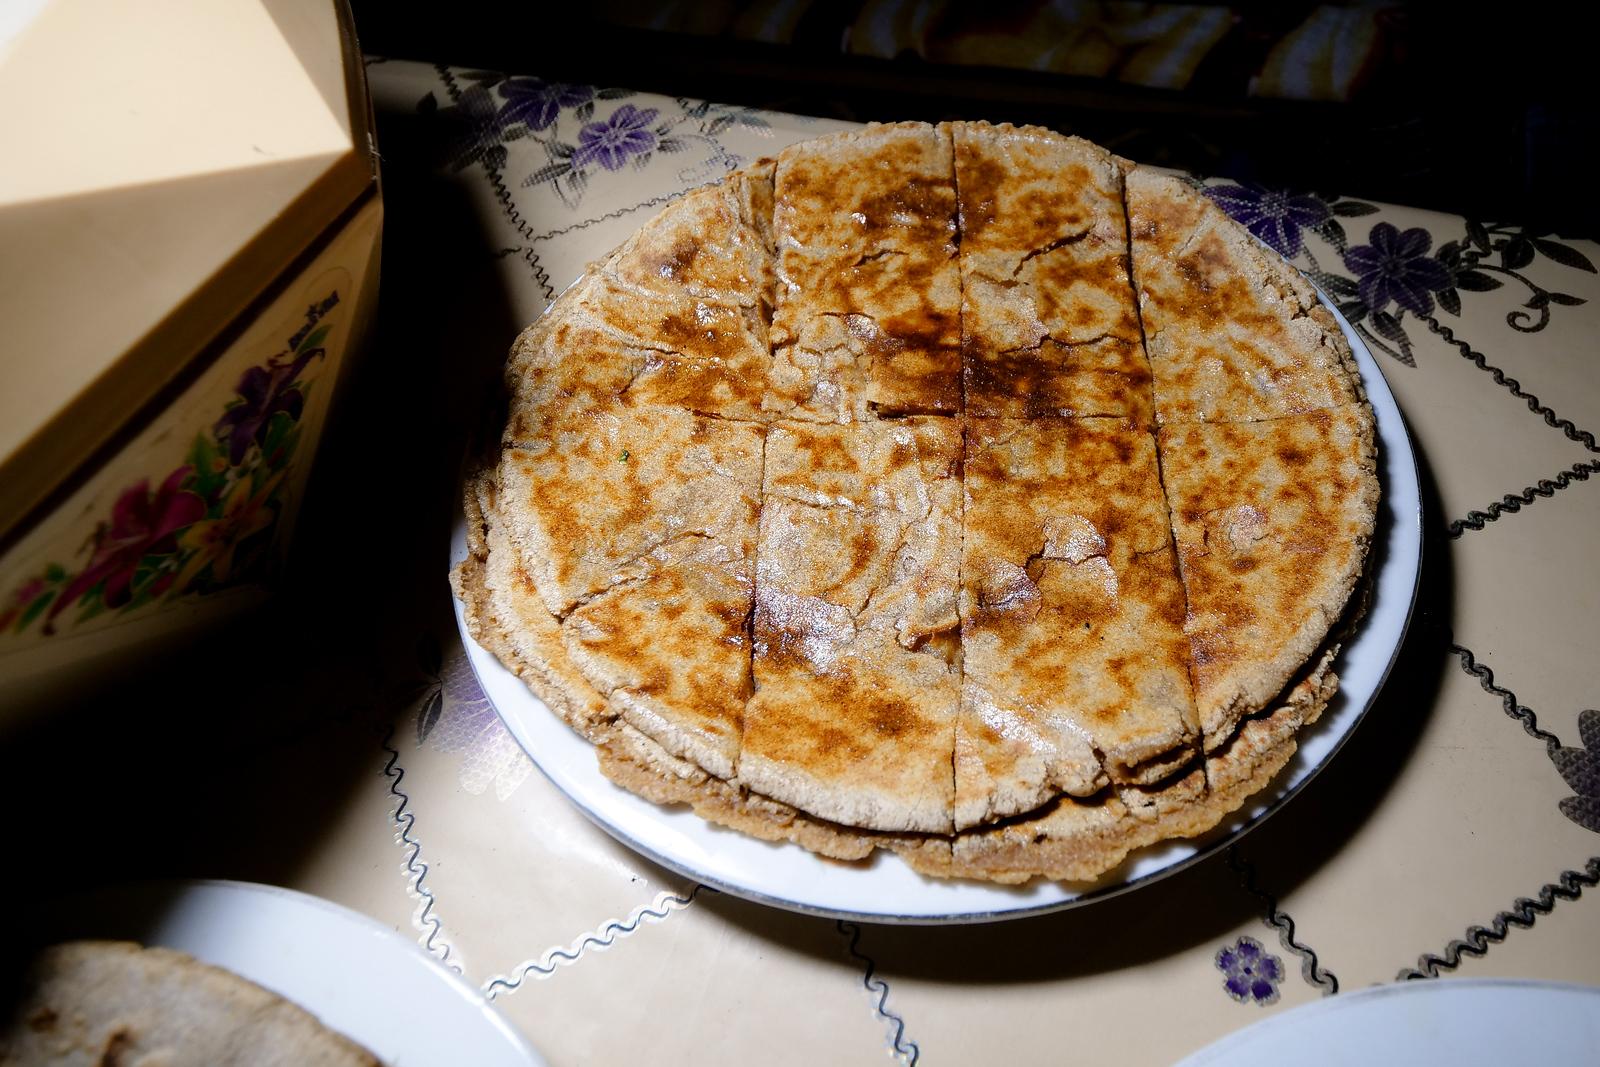 Gyal核桃糊,传统Balti的食品